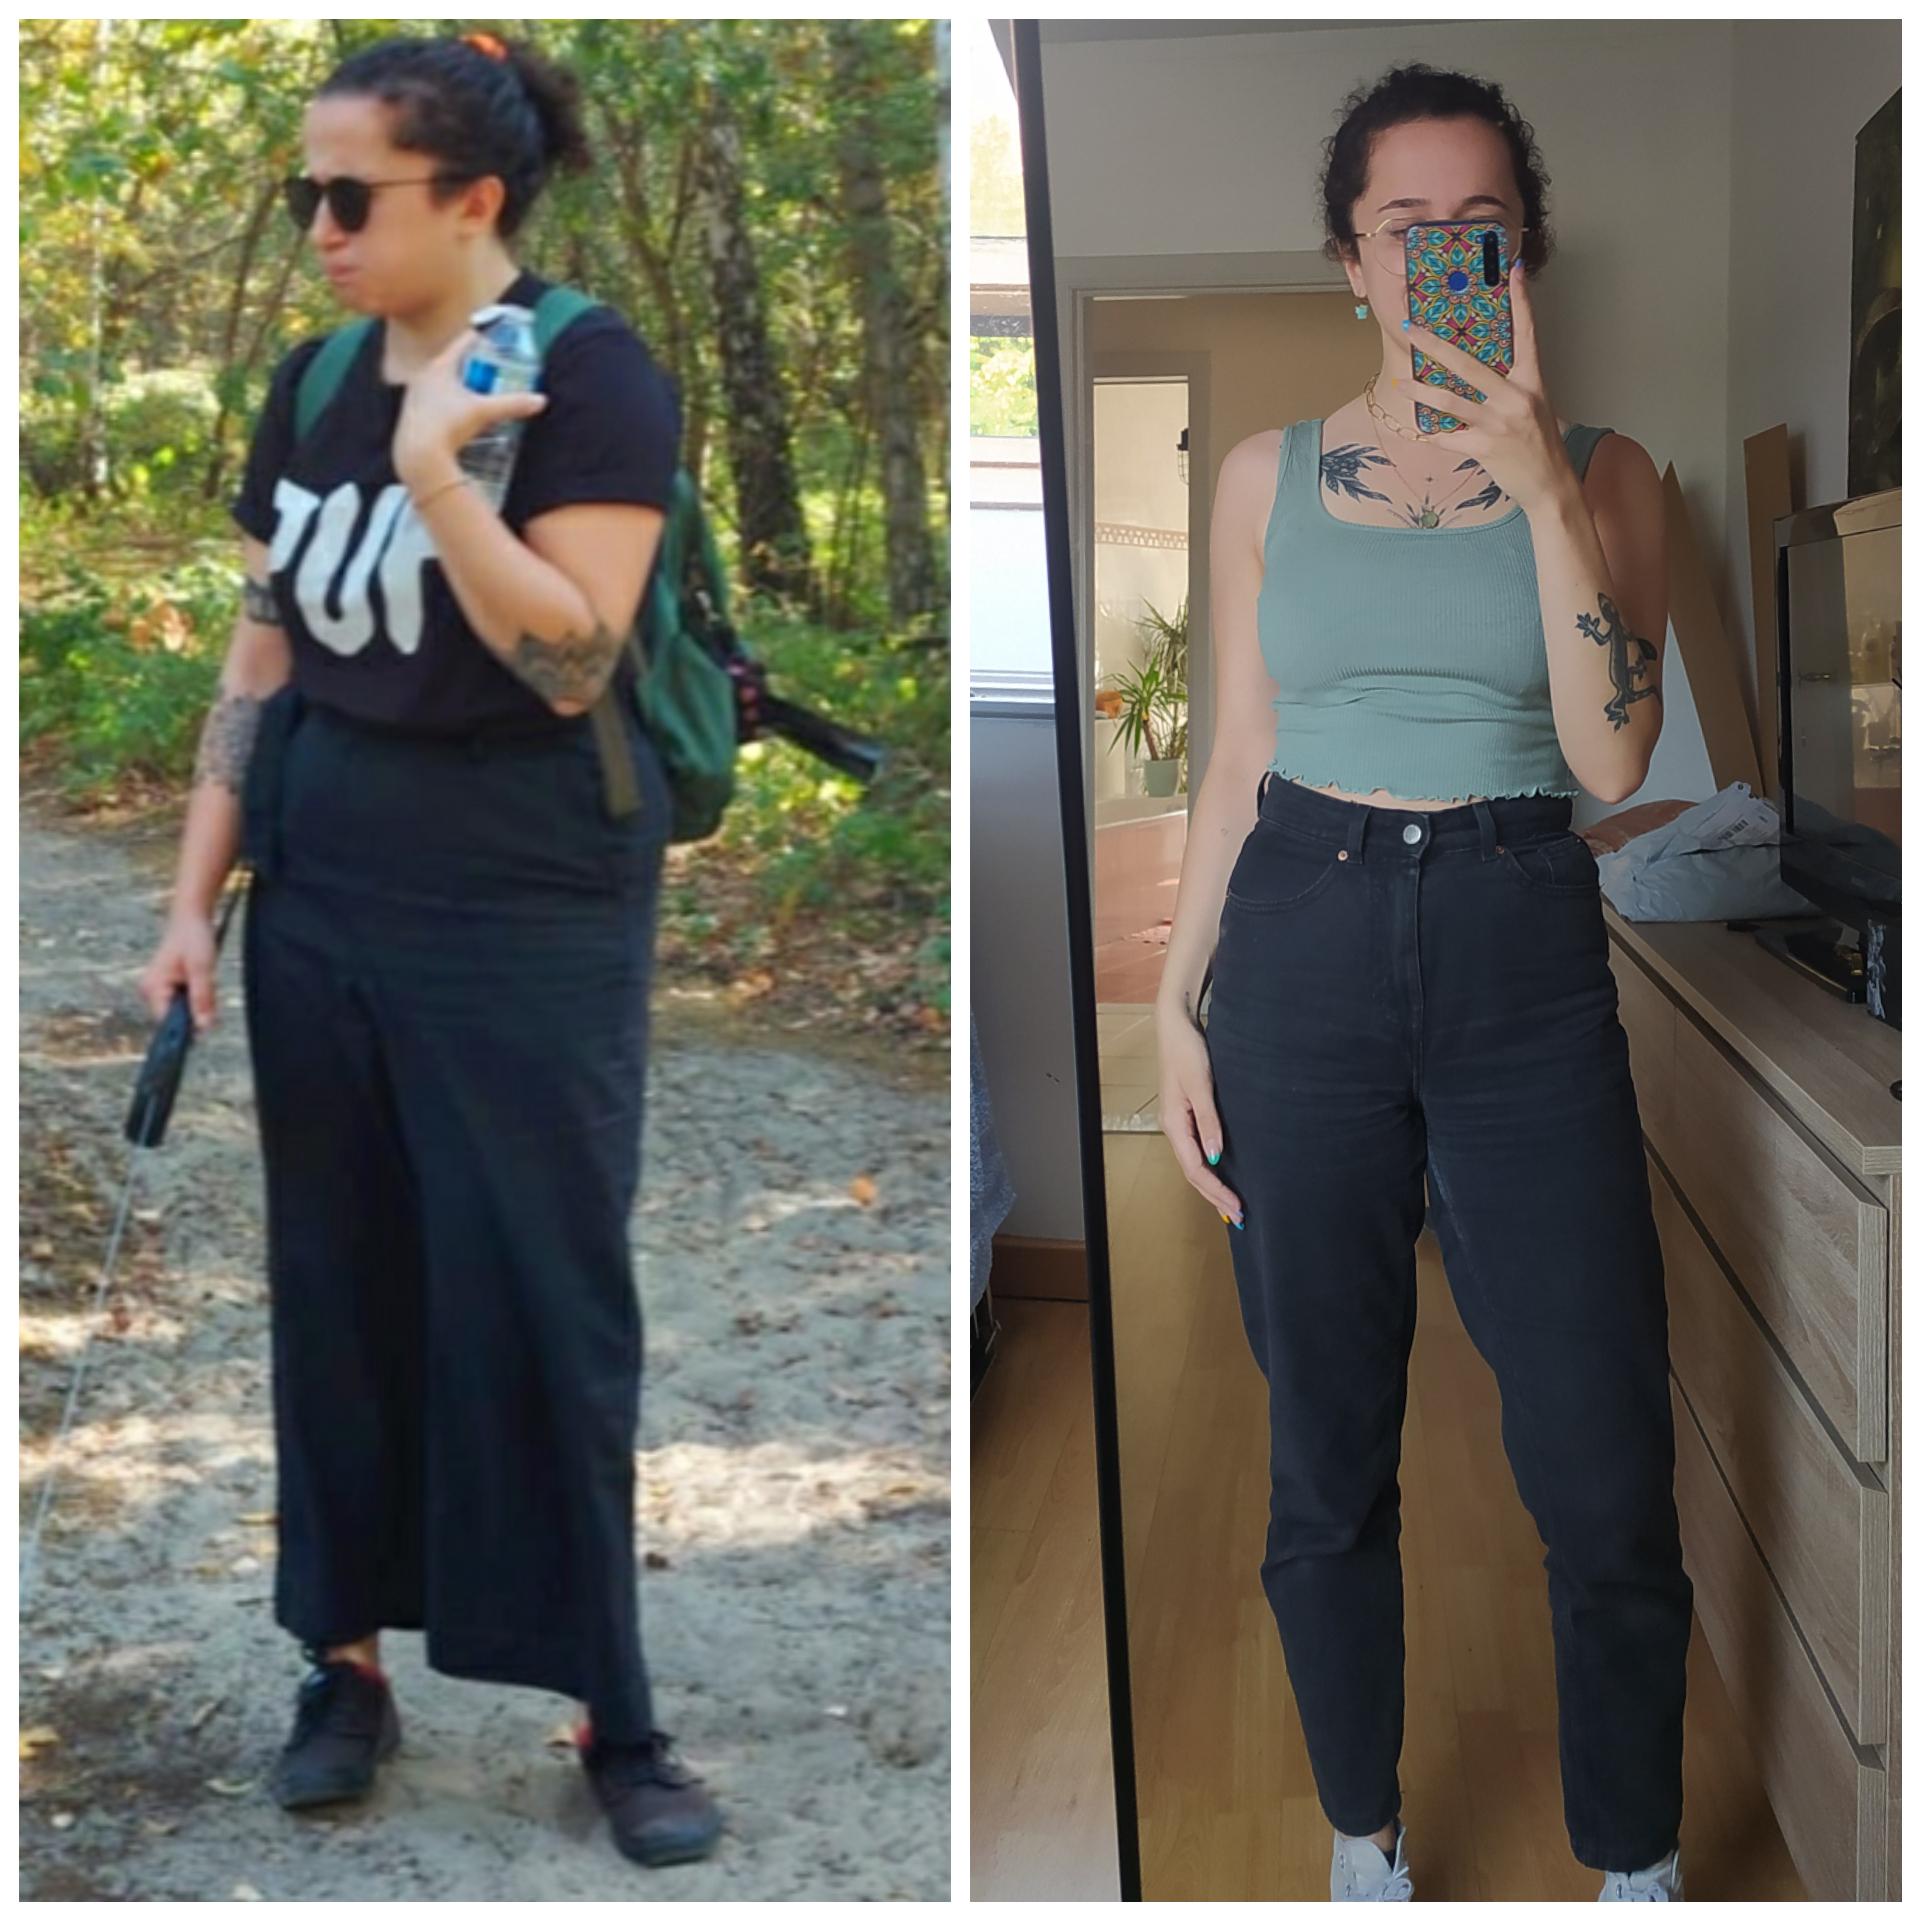 5 foot 4 Female Progress Pics of 39 lbs Weight Loss 165 lbs to 126 lbs